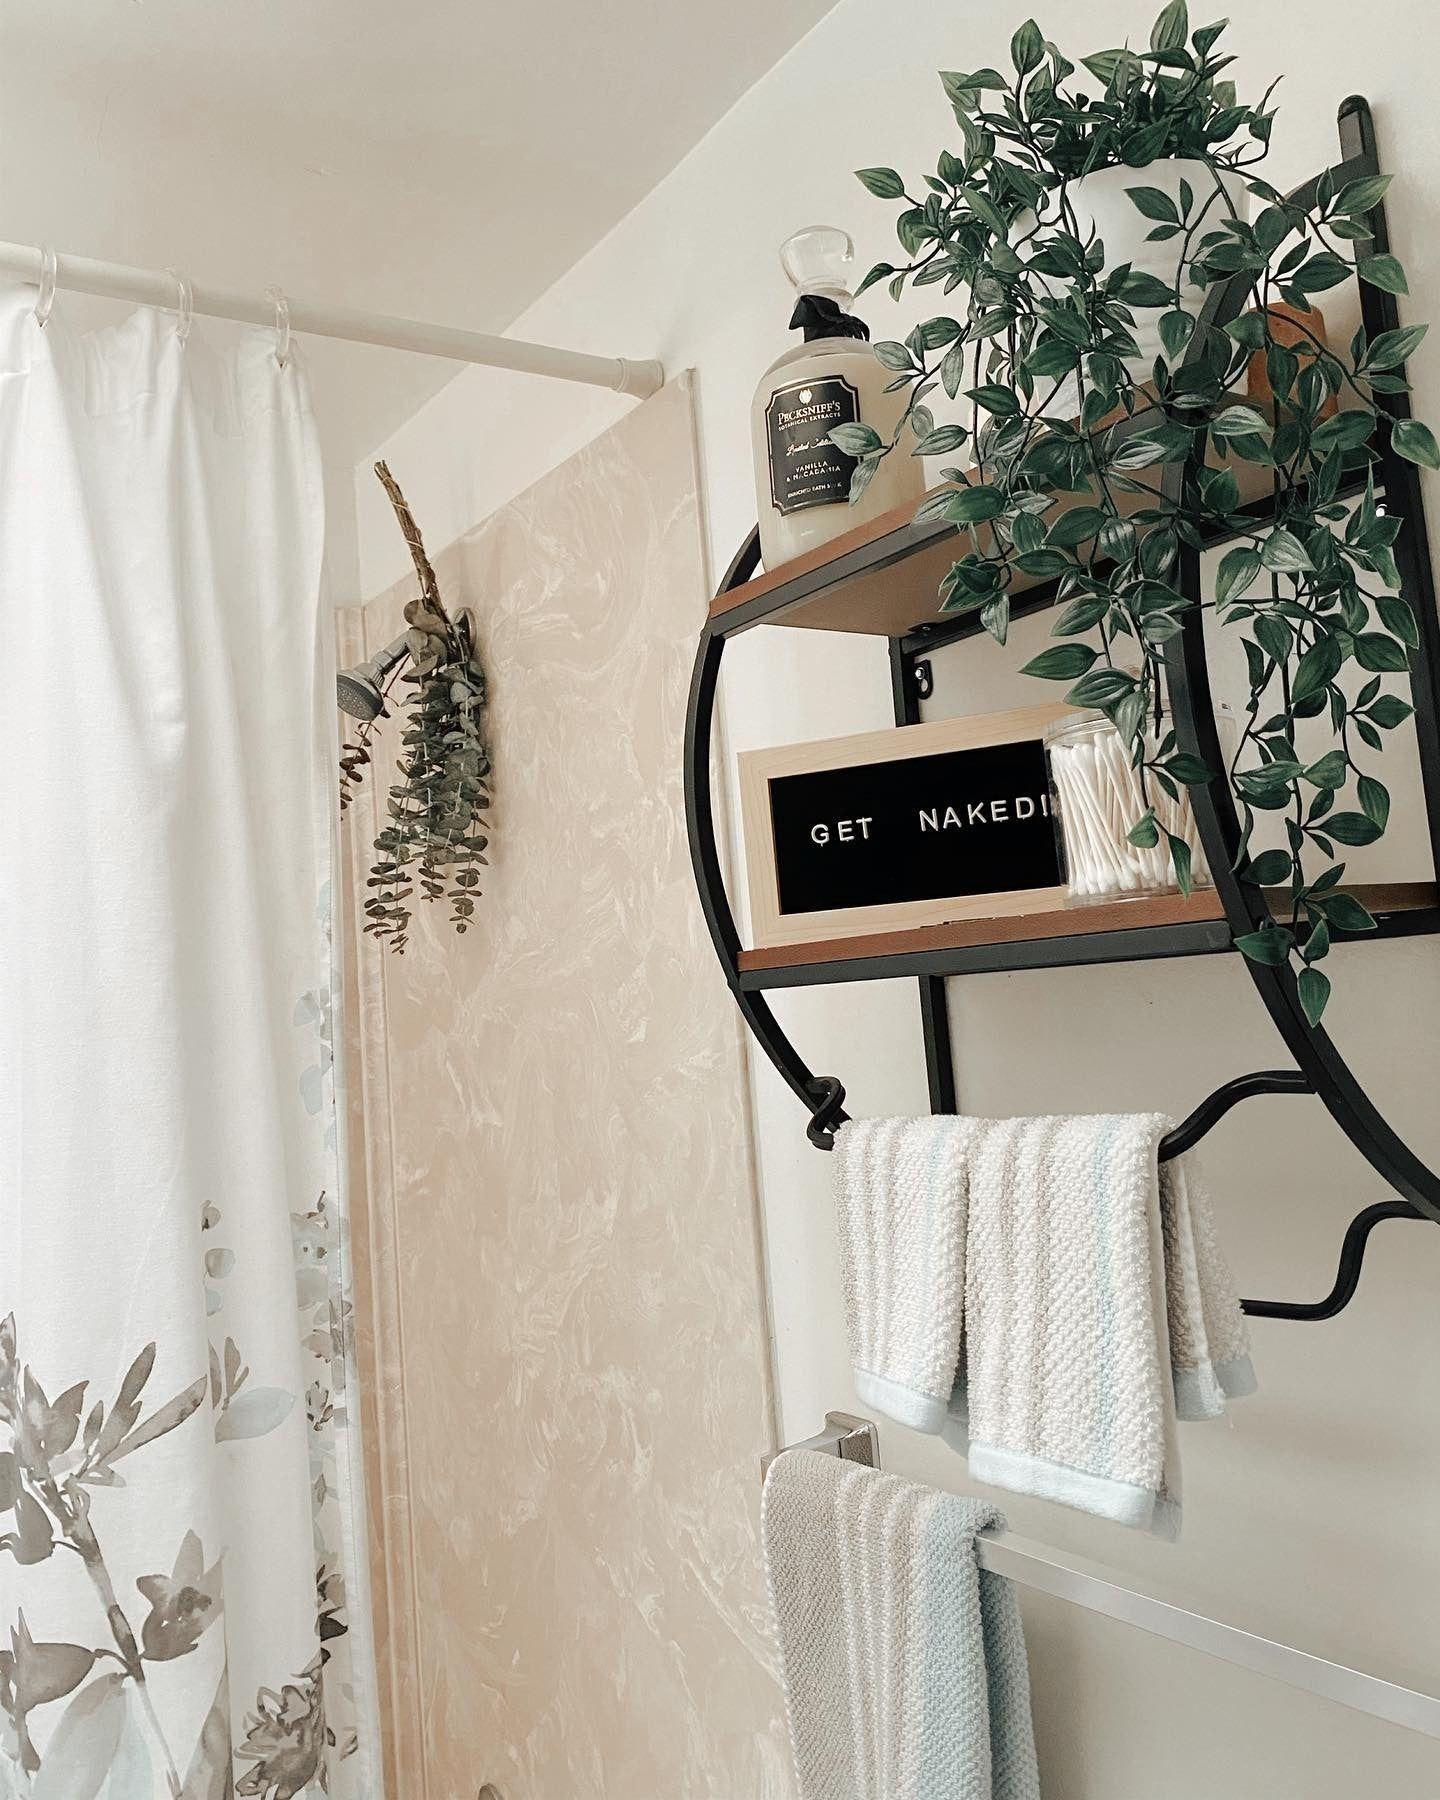 Fresh eucalyptus and an organized bathroom shelf are the perfect